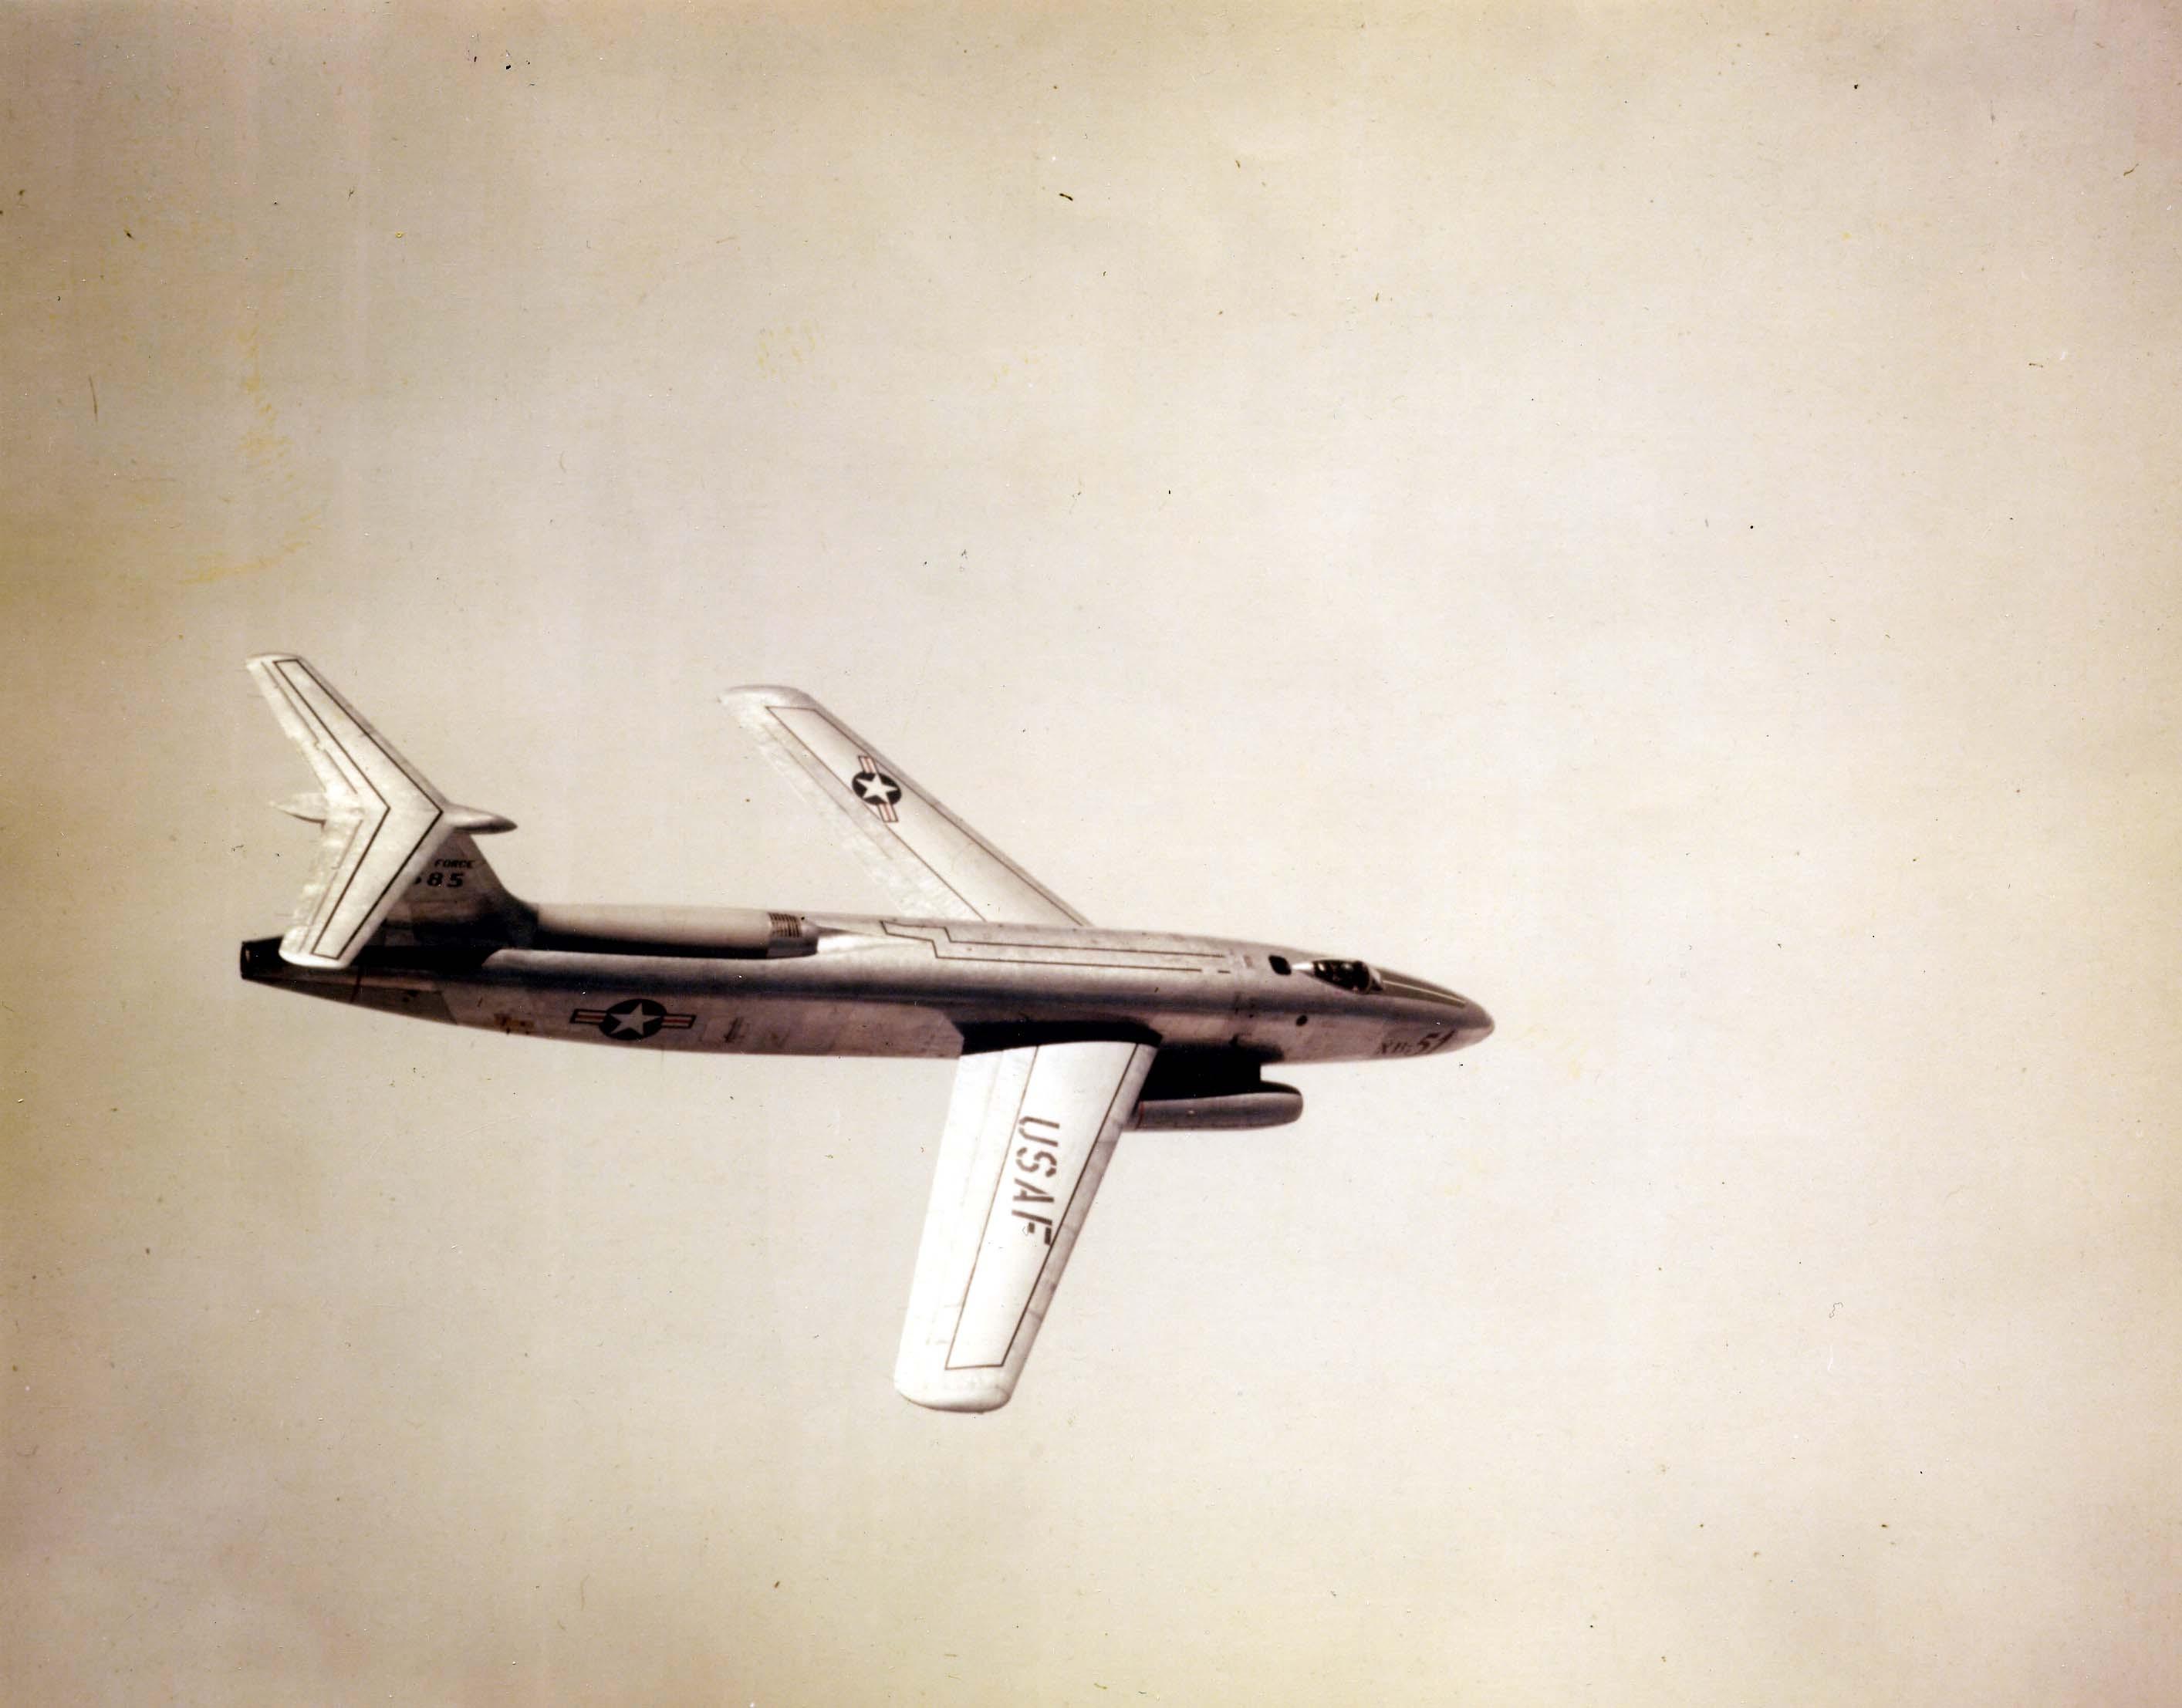 file martin xb 51 46 585 in flight colour jpg wikimedia commons